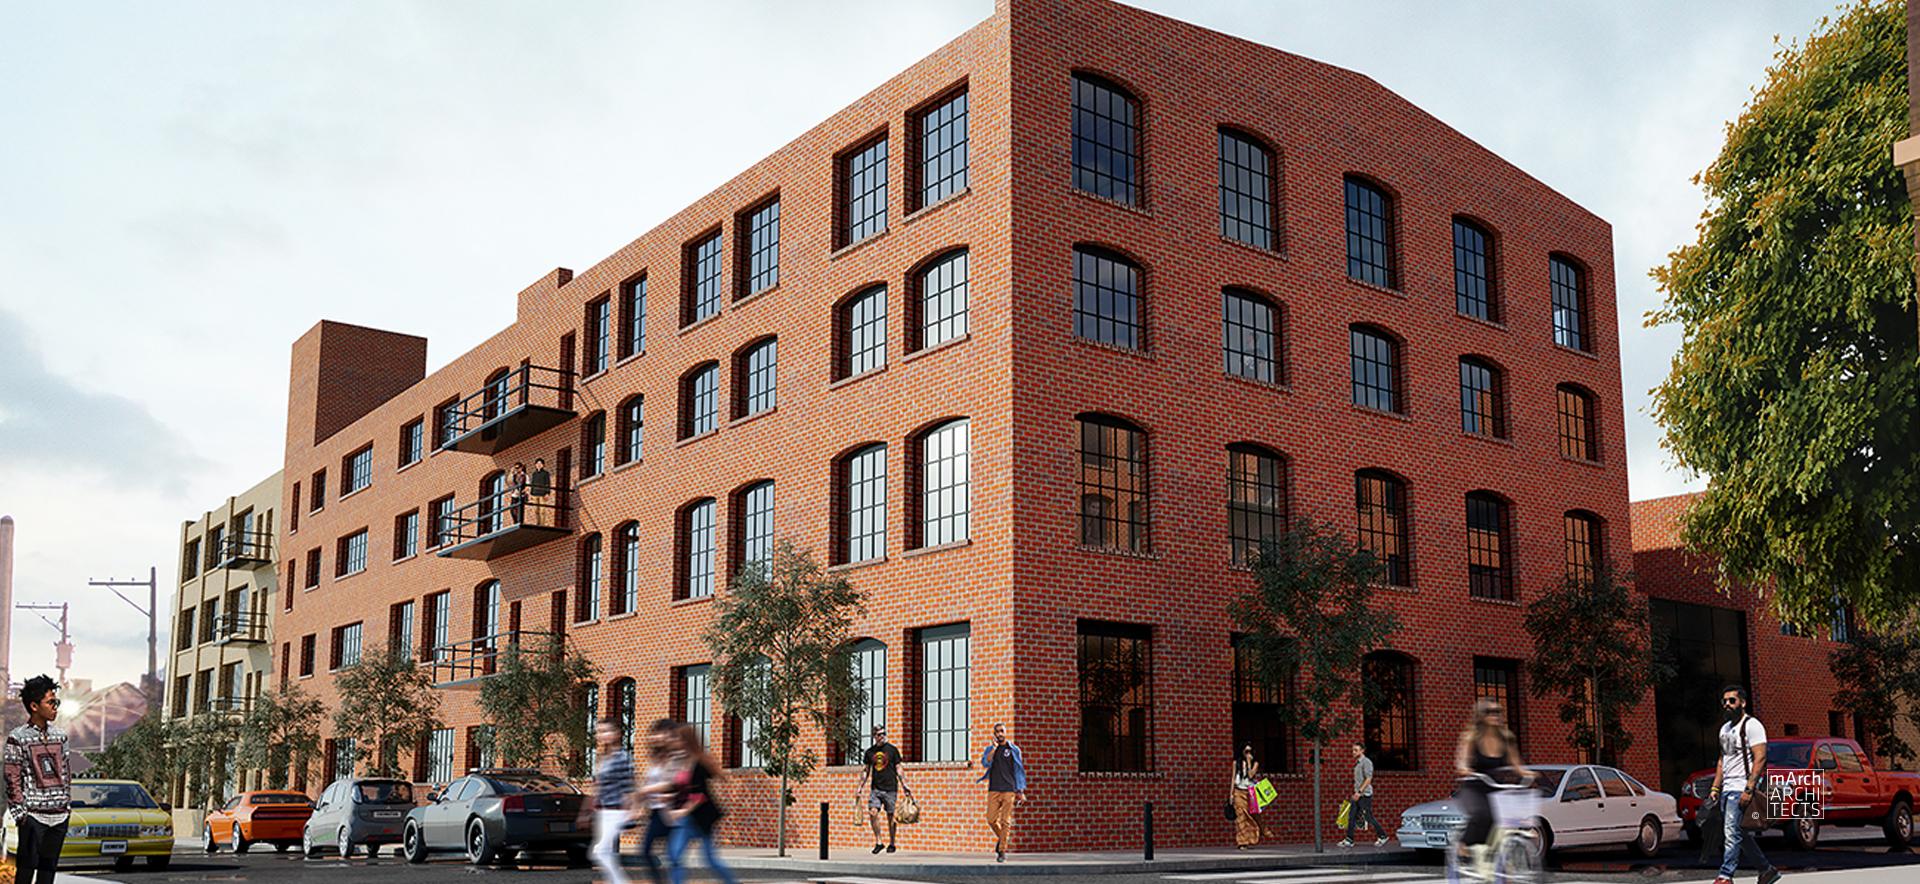 03 | Historical warehouse conversion